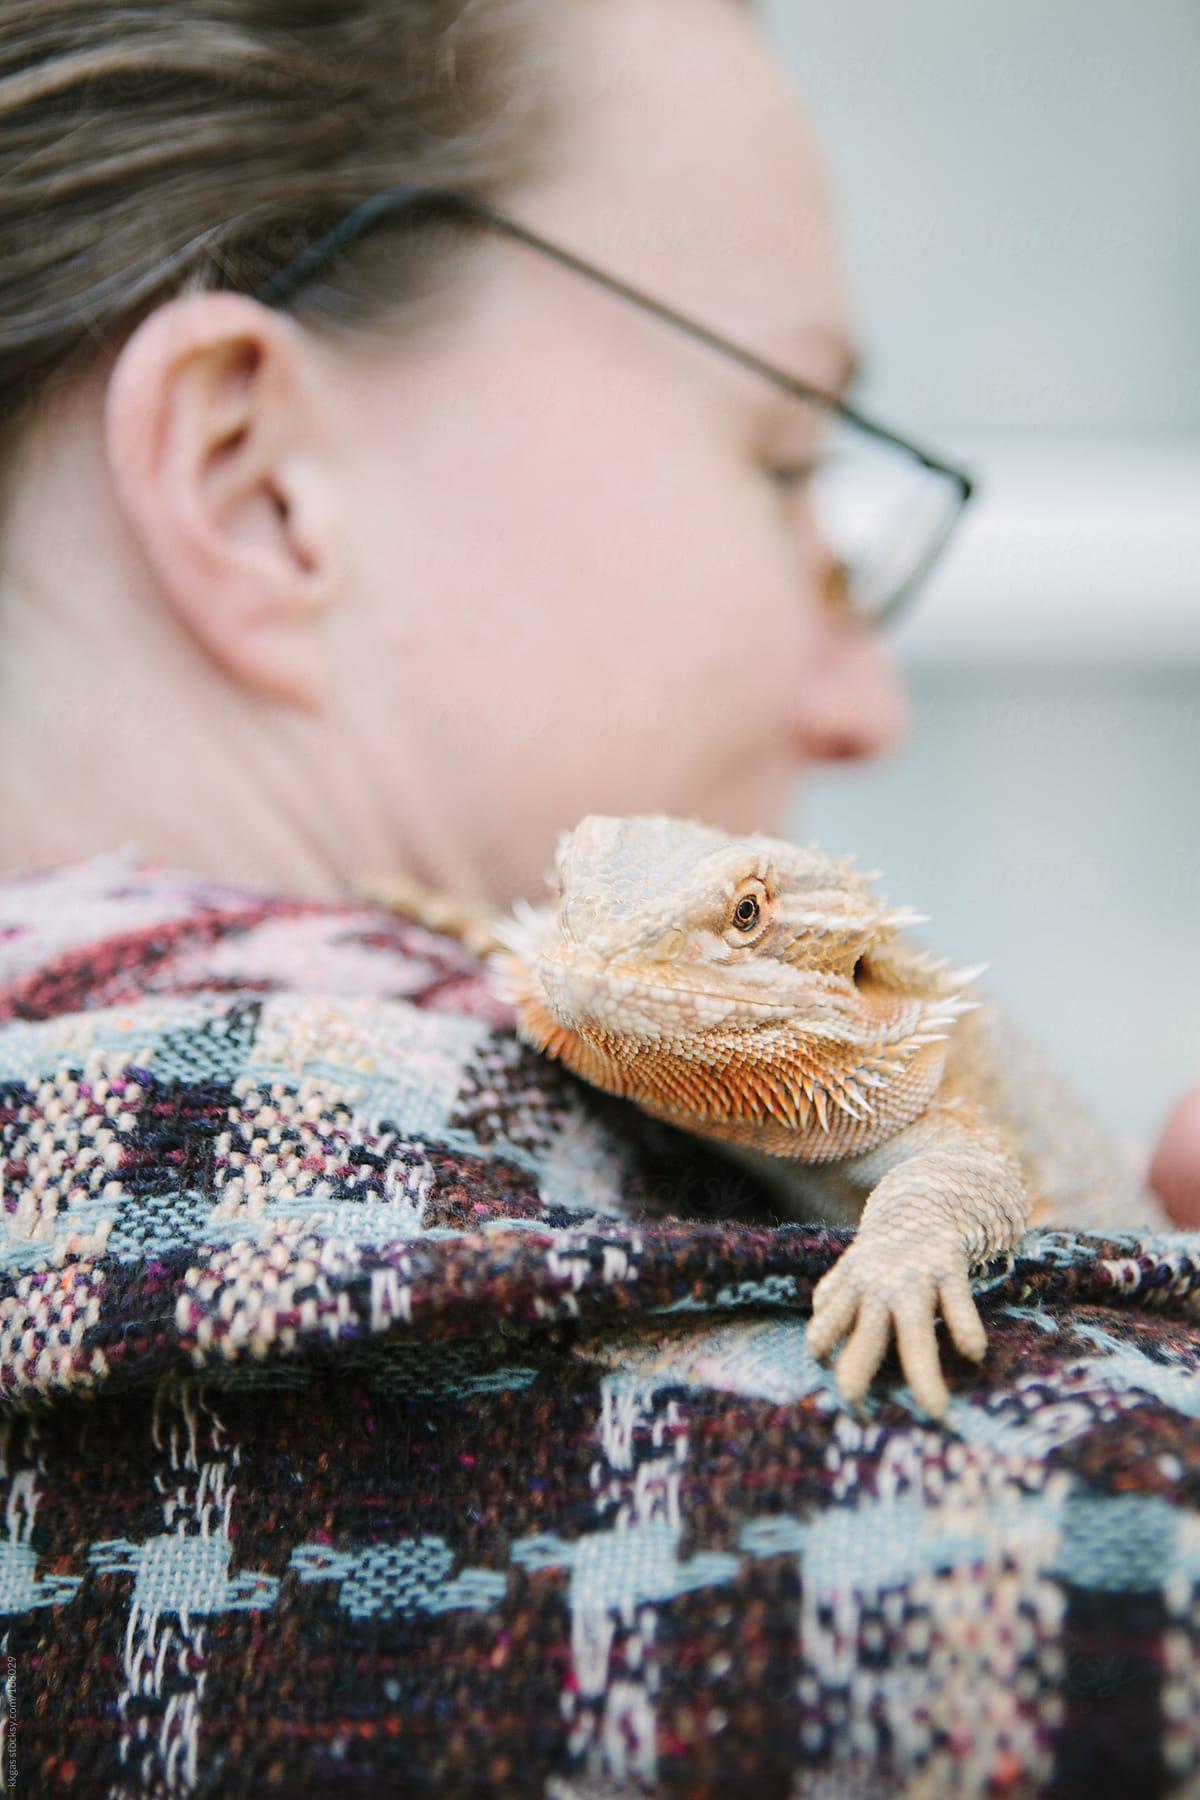 Bearded Dragon on a woman's shoulder by kkgas - Stocksy United